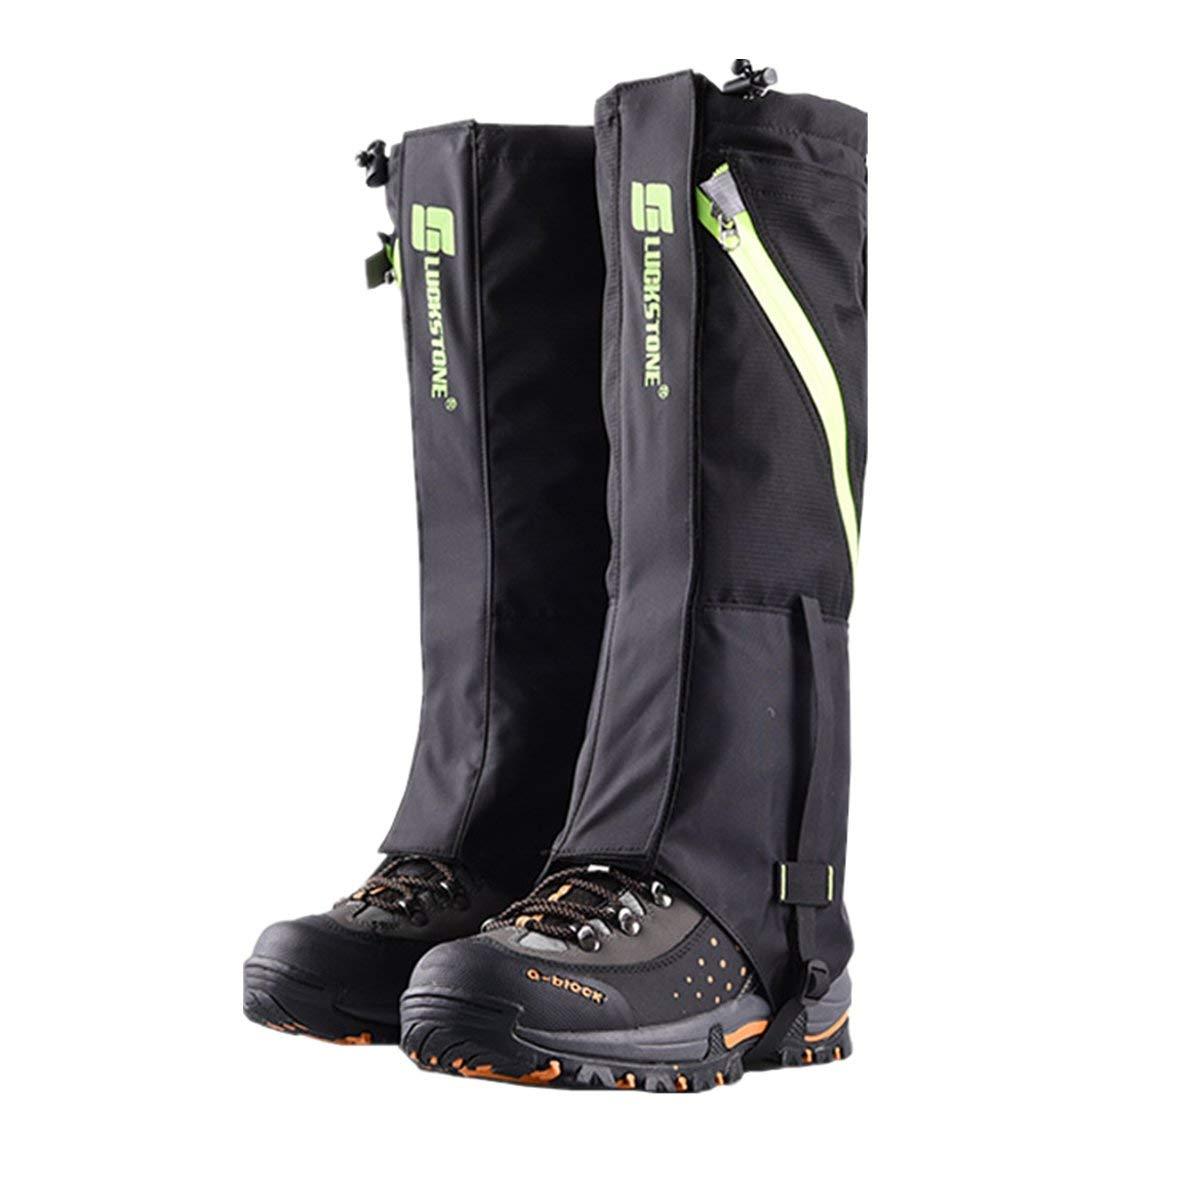 Tuban Hiking Gaiters Snow Gaiters Waterproof Boot Gaiters Reinforced TPU Strap Breathable Nylon